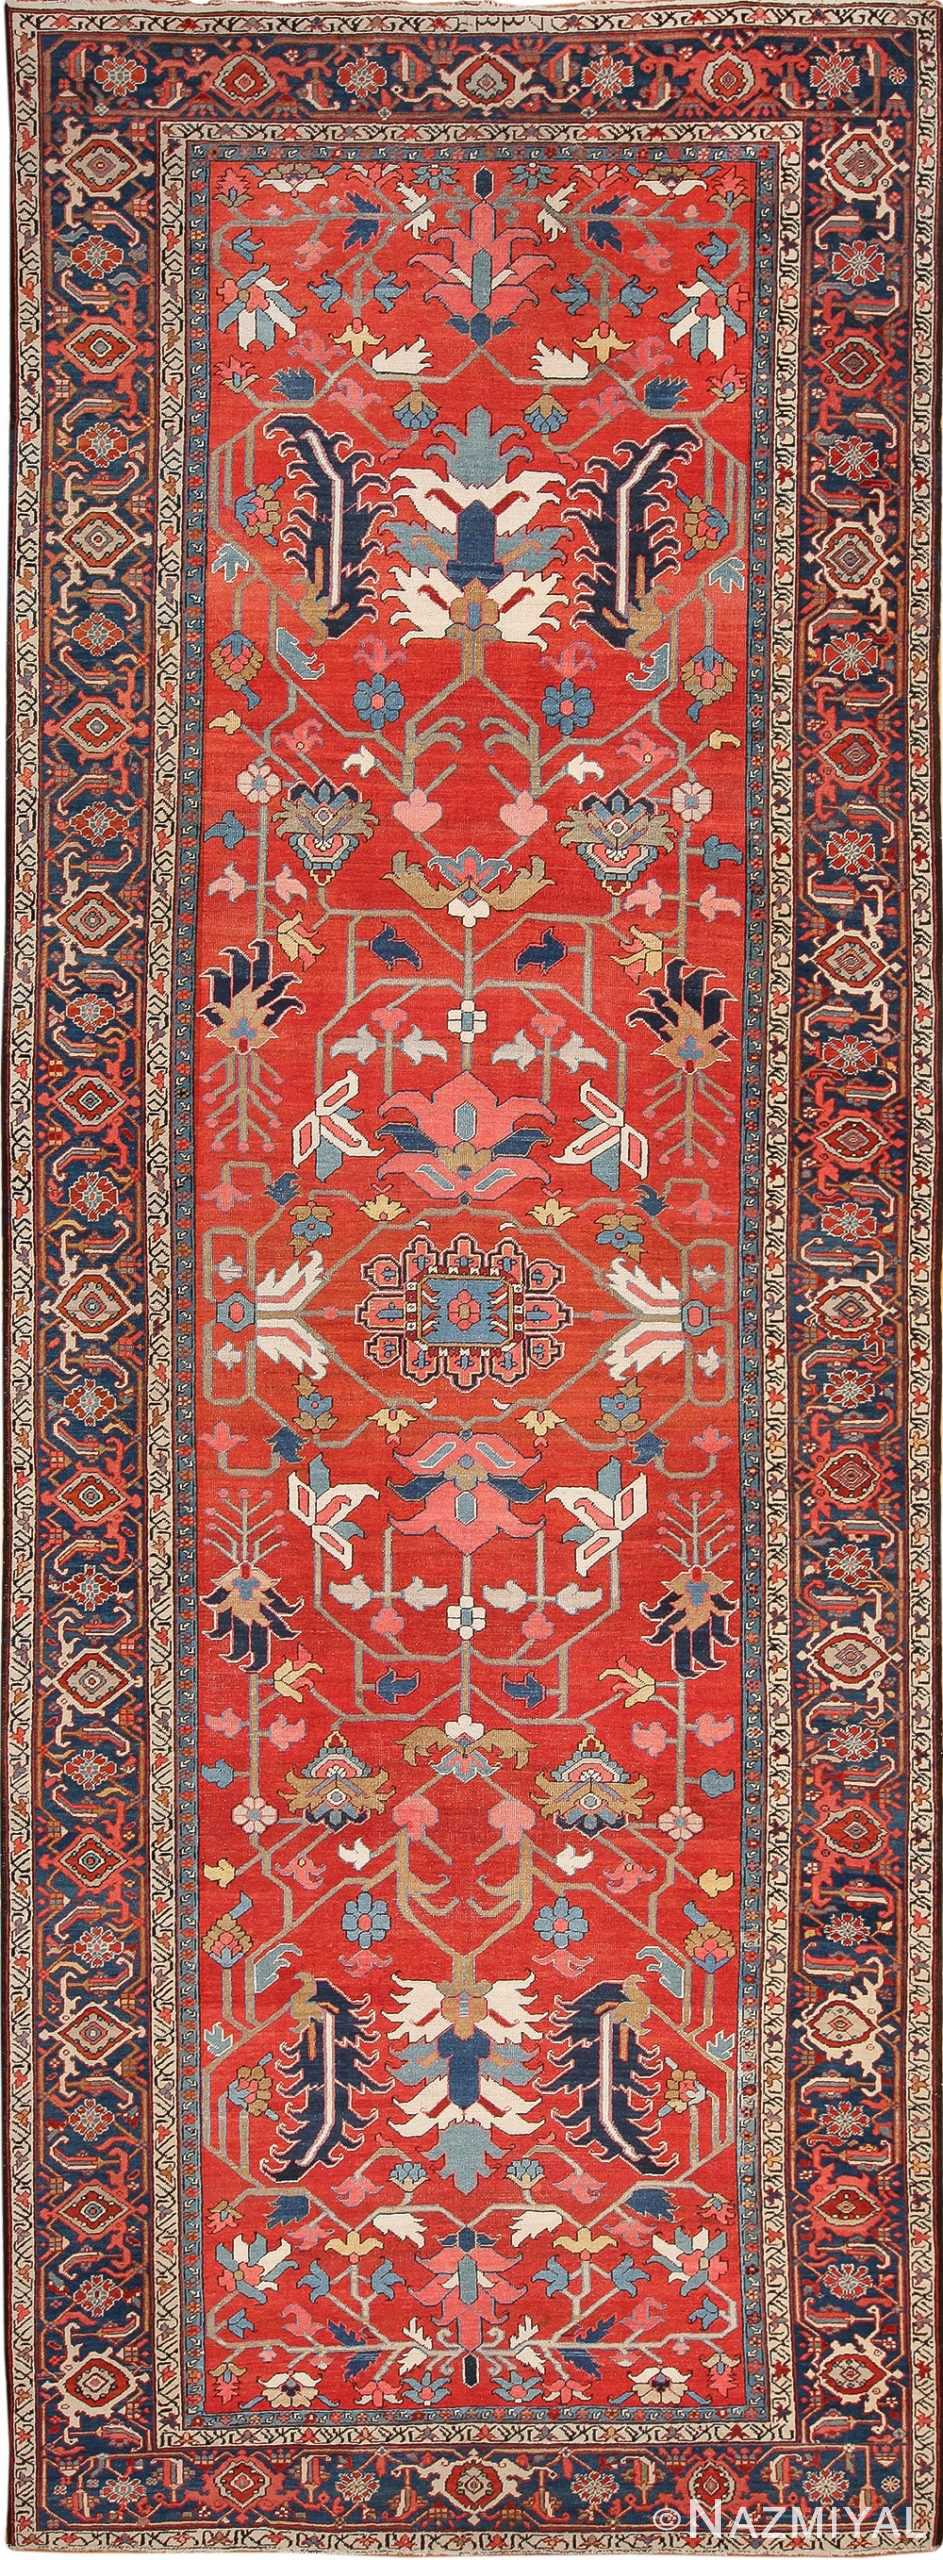 Wide Hallway Gallery Size Antique Persian Heriz Rug 49766 - Nazmyal